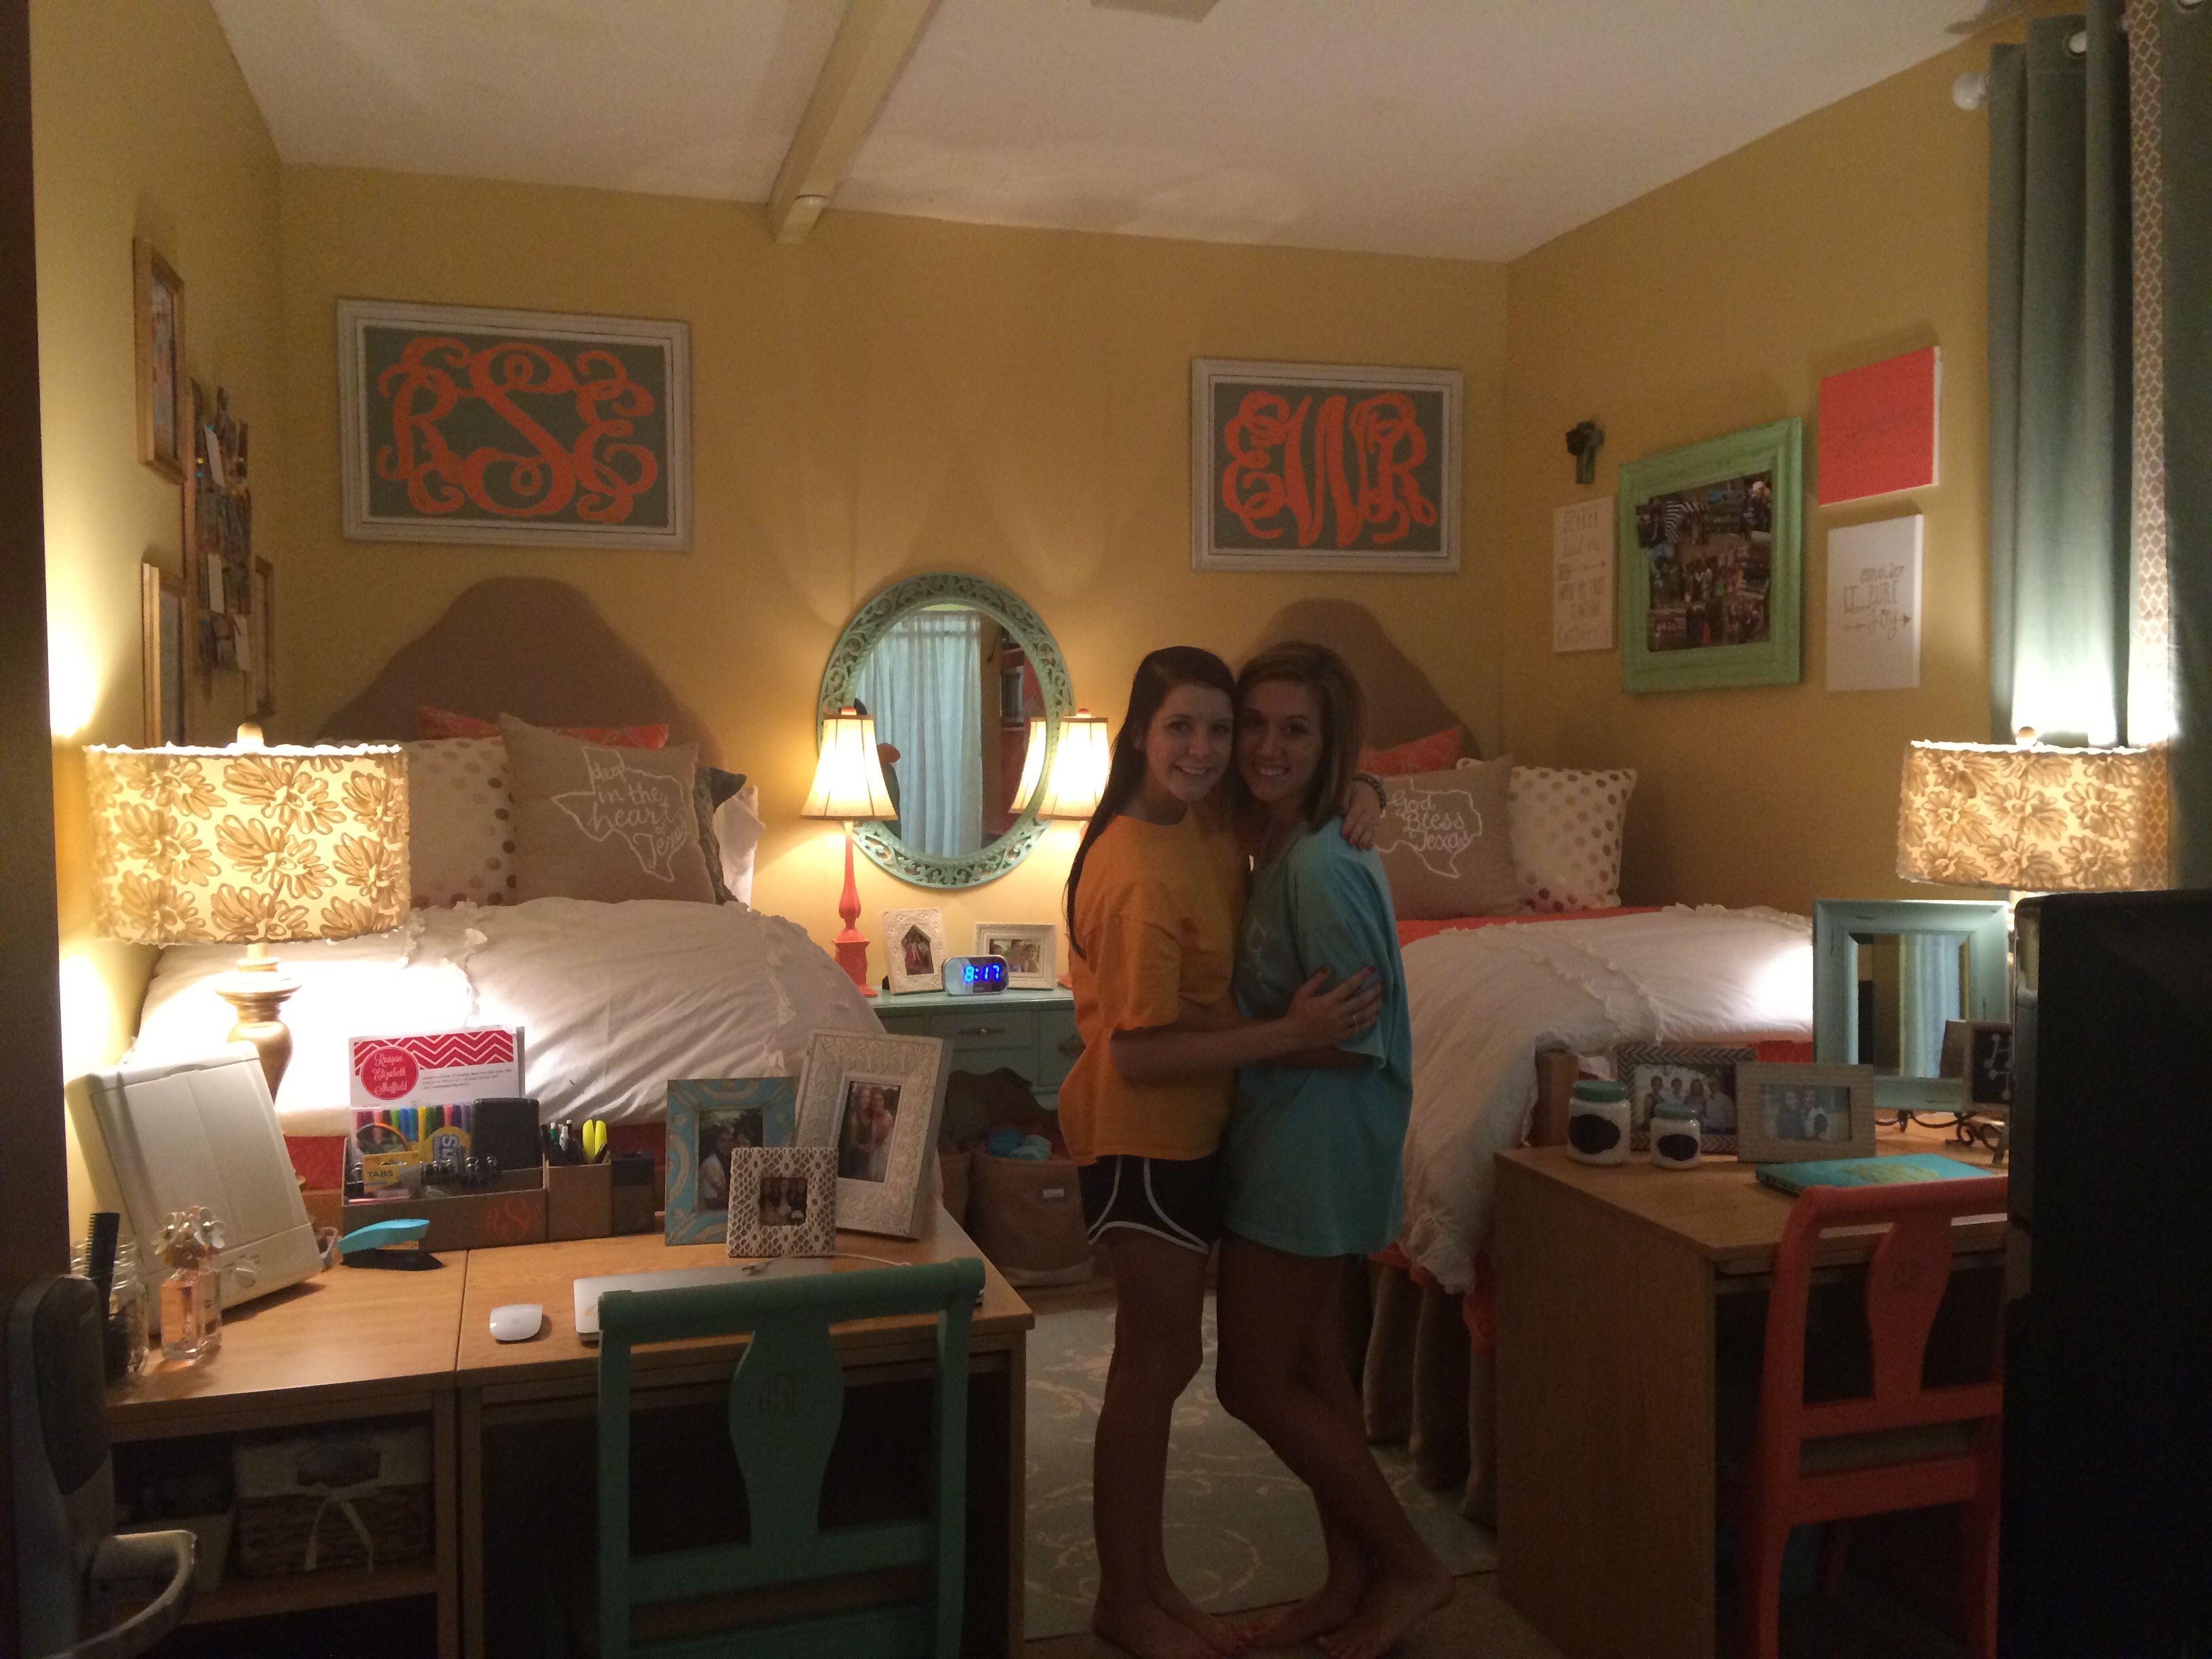 Dorm room furniture layout - College Dorm Rooms